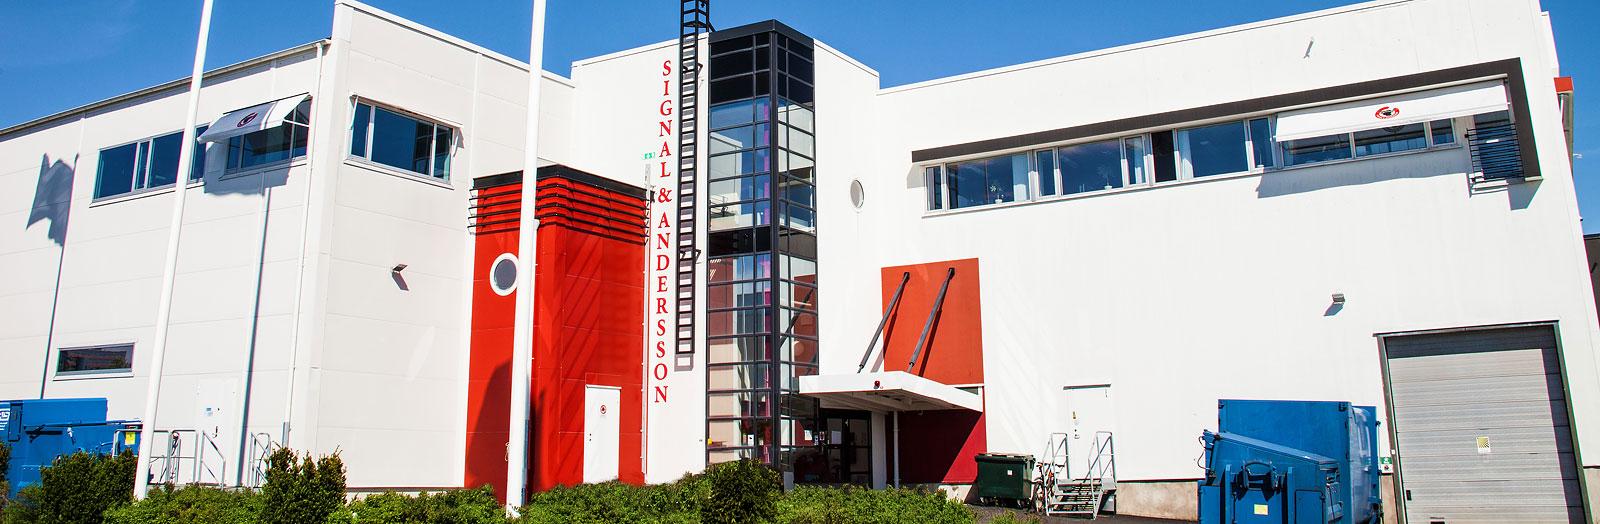 Signal & Anderssons charkuterifabrik i Sisjön